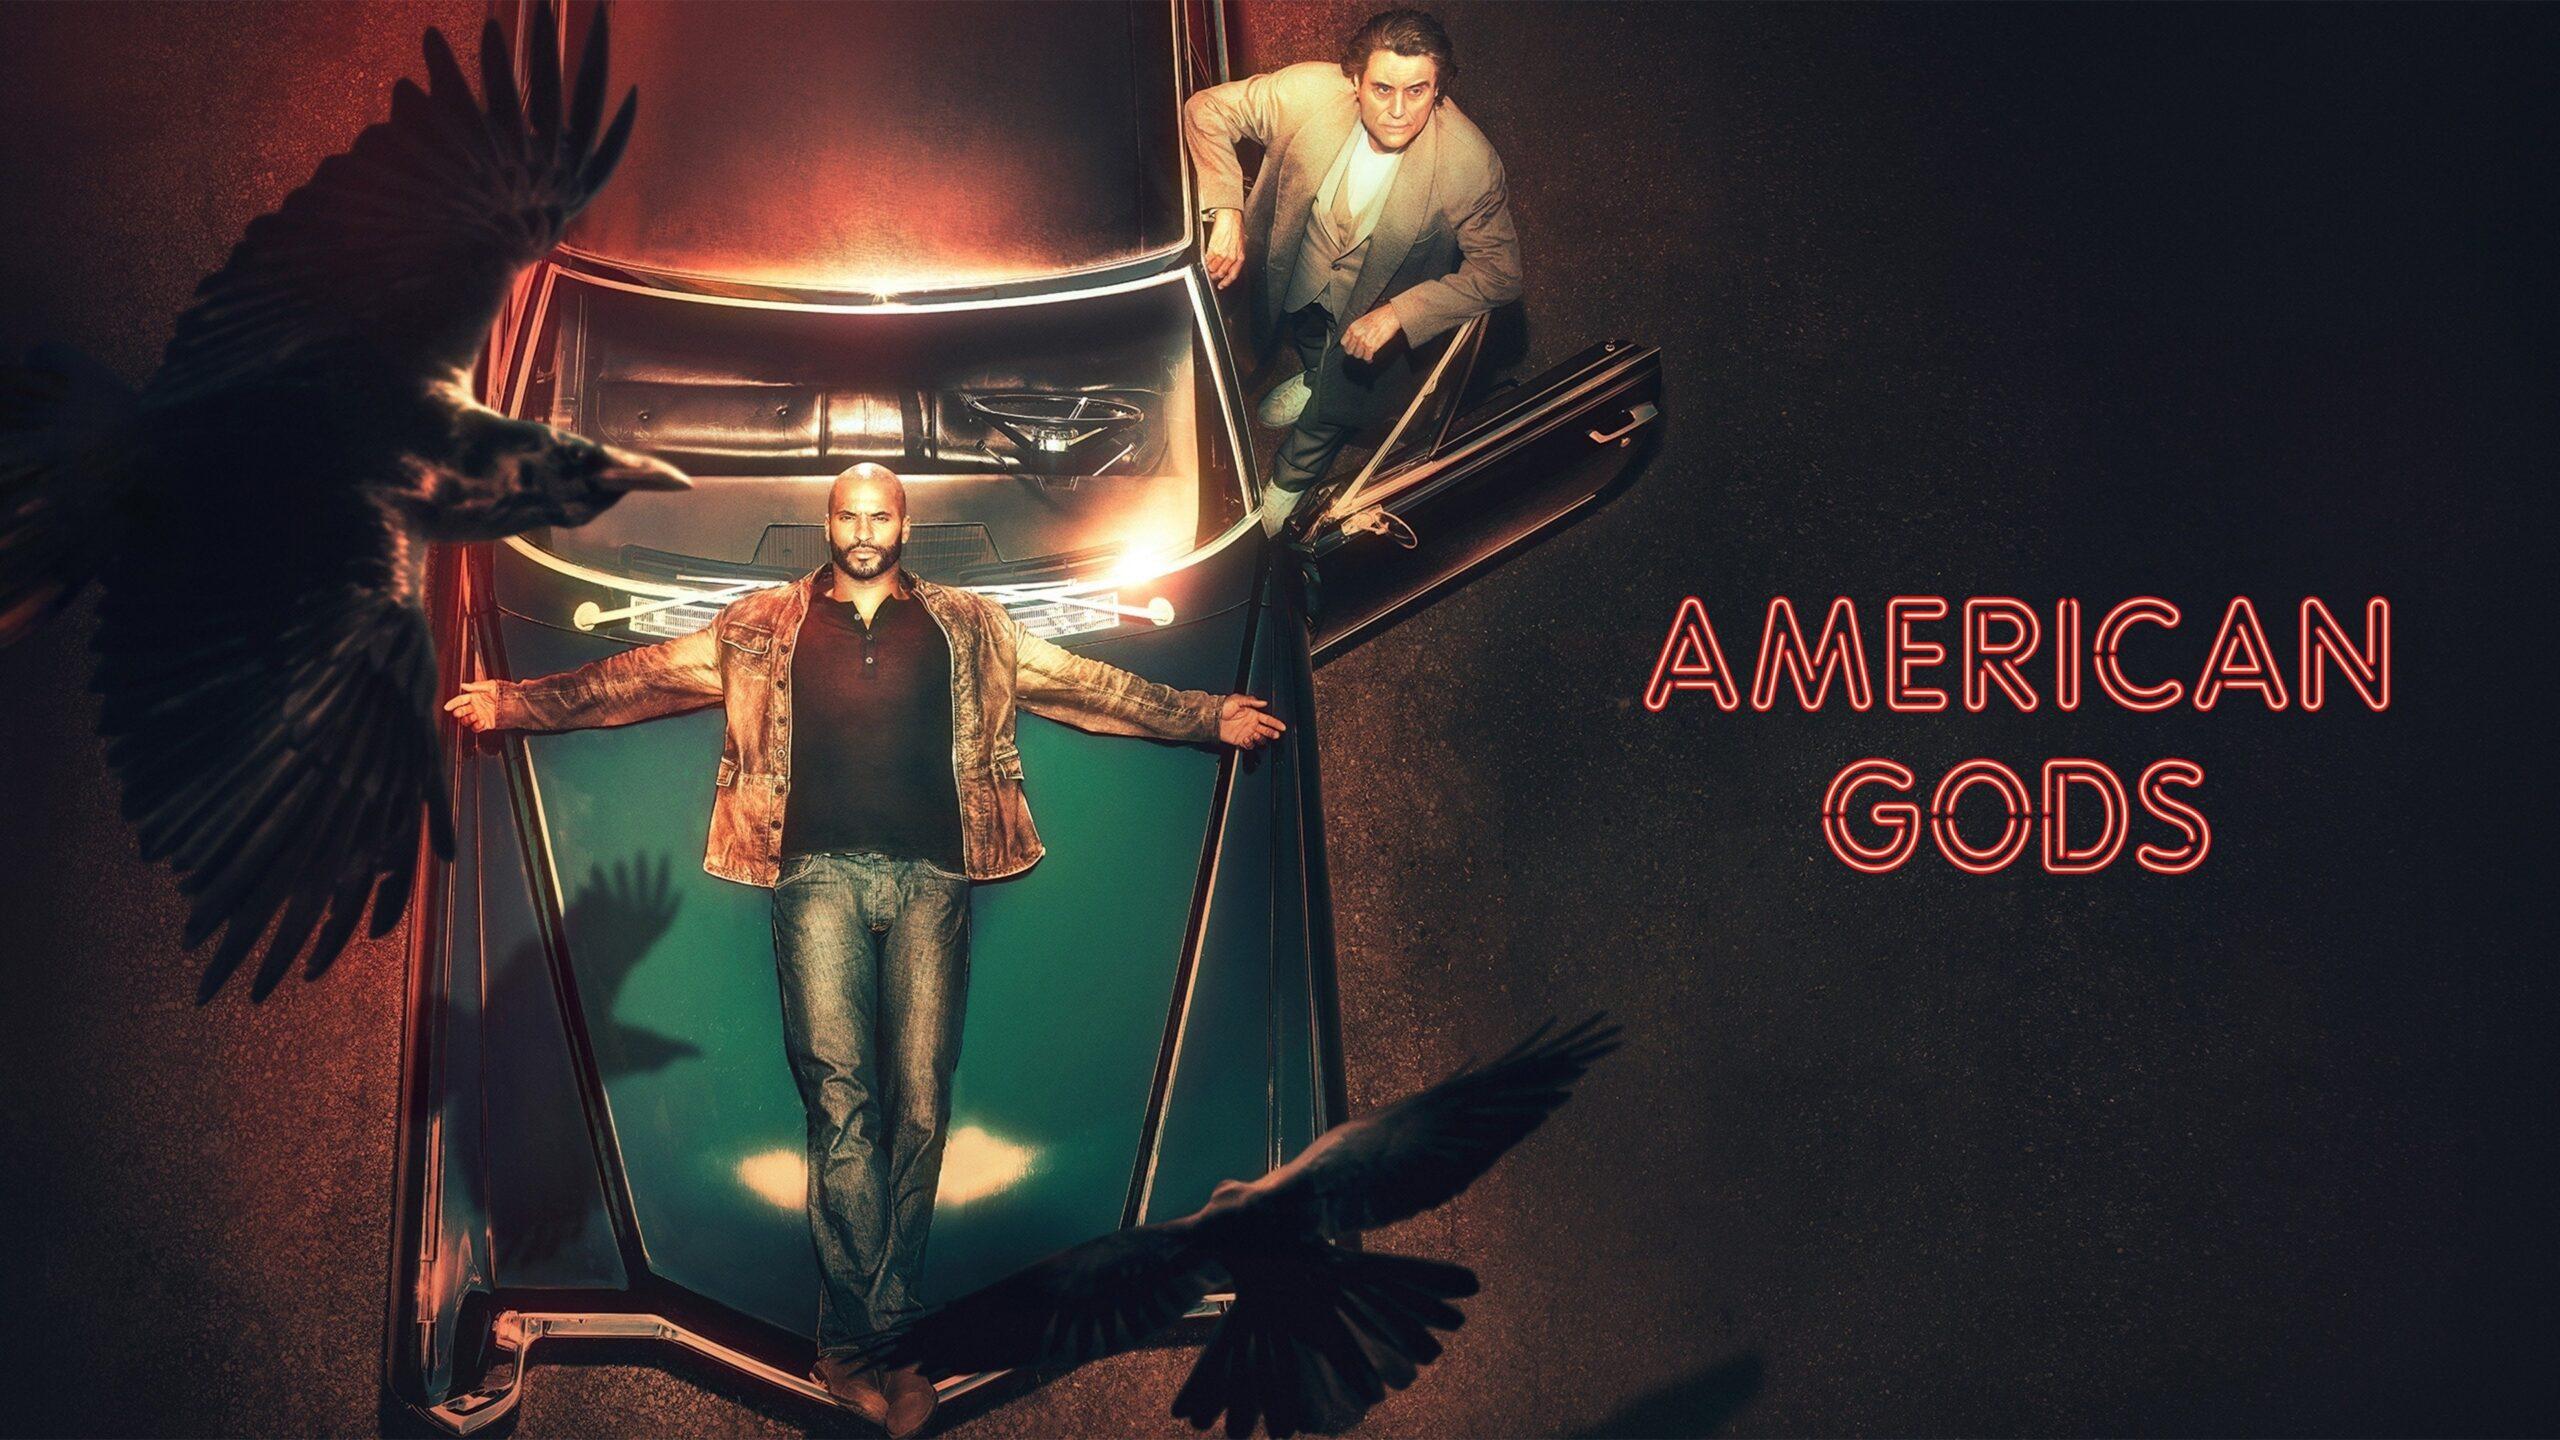 American Gods Season 3 Episode 5